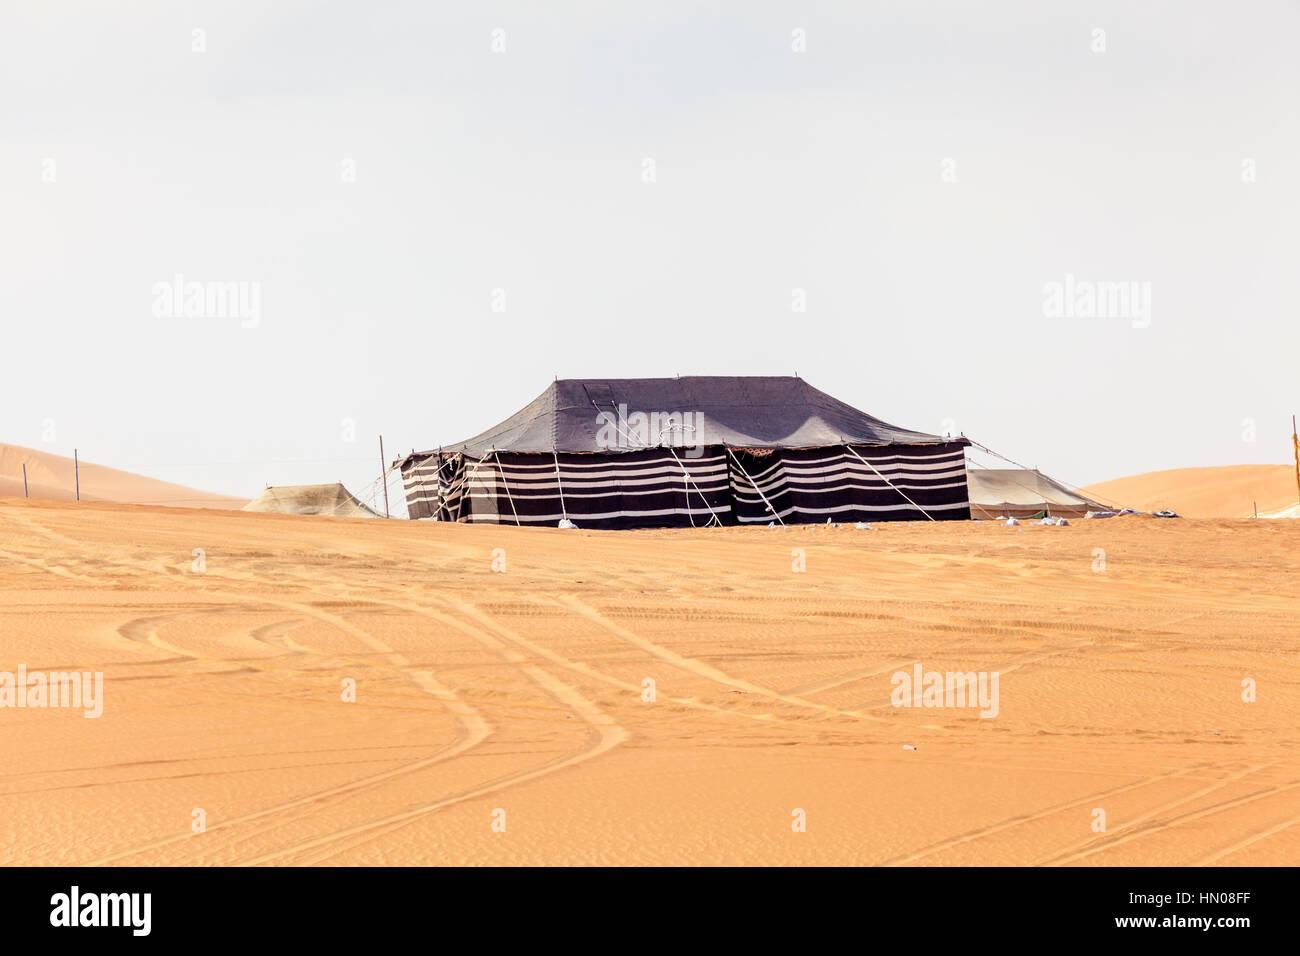 Desert Camp a duna Moreeb in Liwa Oasis area. Emirato di Abu Dhabi, Emirati Arabi Uniti, Medio Oriente Immagini Stock